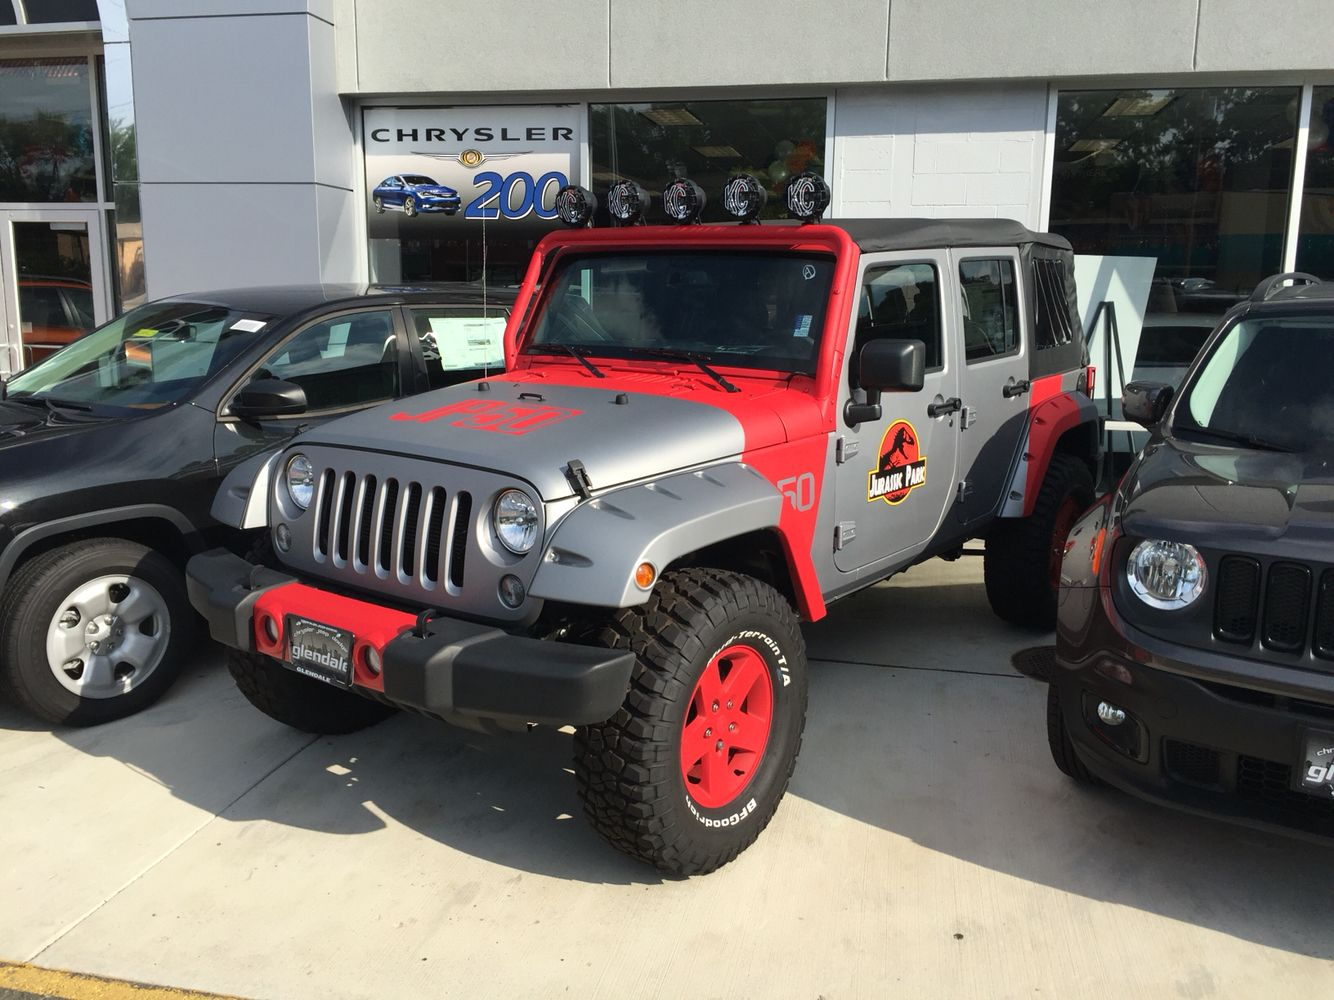 jeep wrangler jk jurassic park edition | jeeps | jurassic park jeep